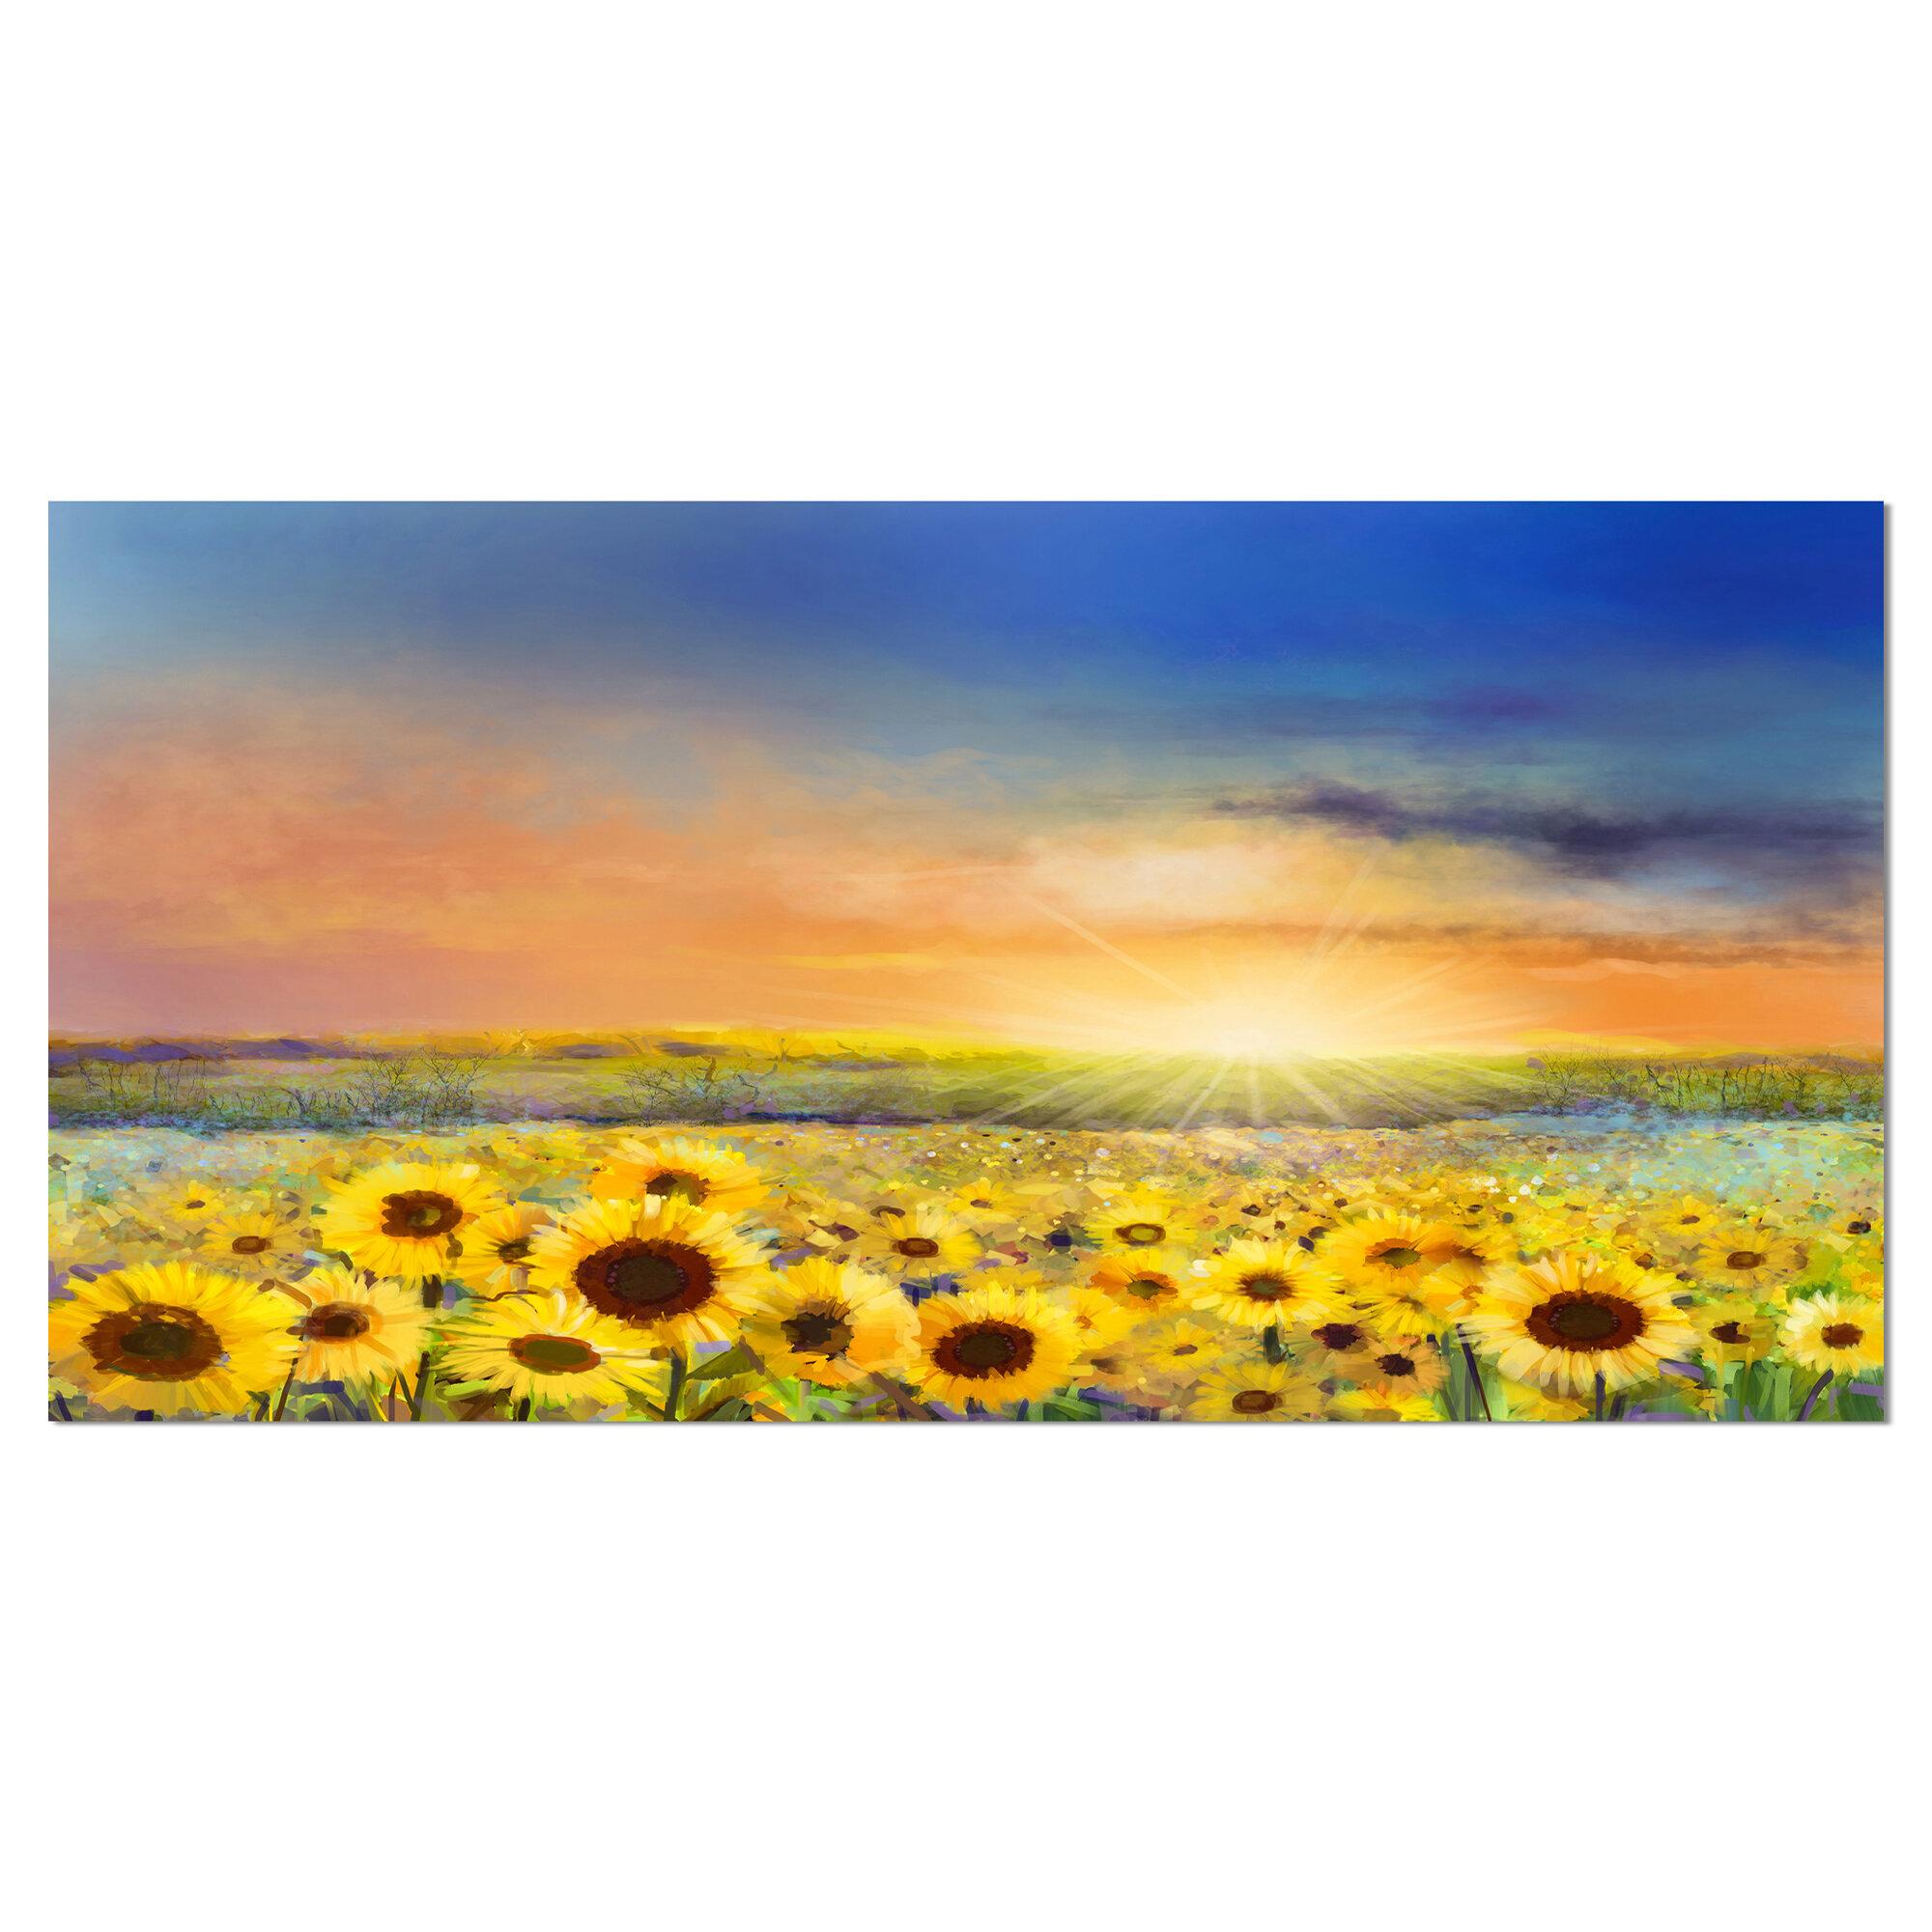 Designart Sunset Over Golden Sunflower Field Painting Print On Wrapped Canvas Wayfair